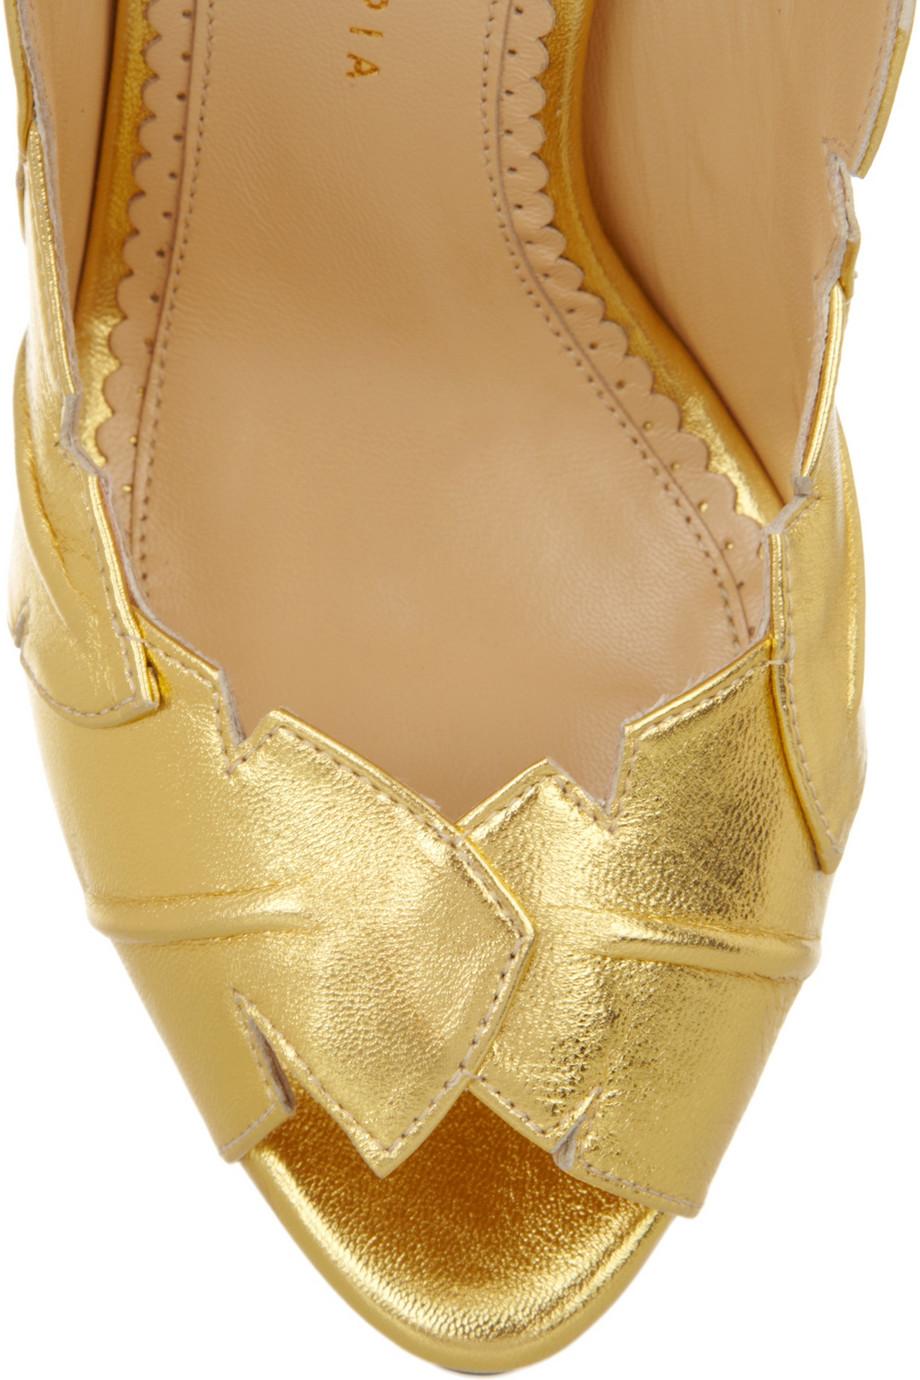 Charlotte Olympia Leaf Me Alone Metallic Leather Sandals